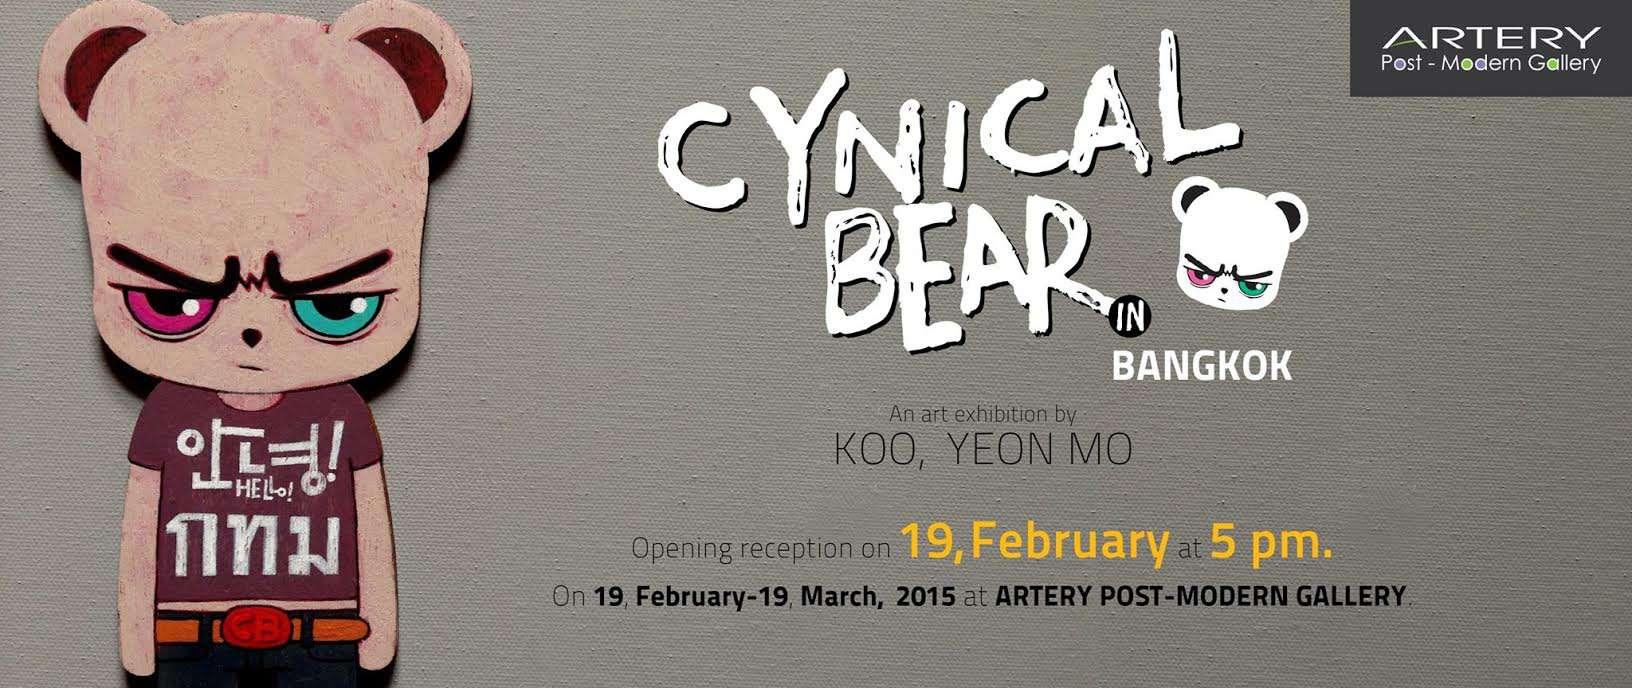 Artery Post Modern Gallery # Cynical Bear